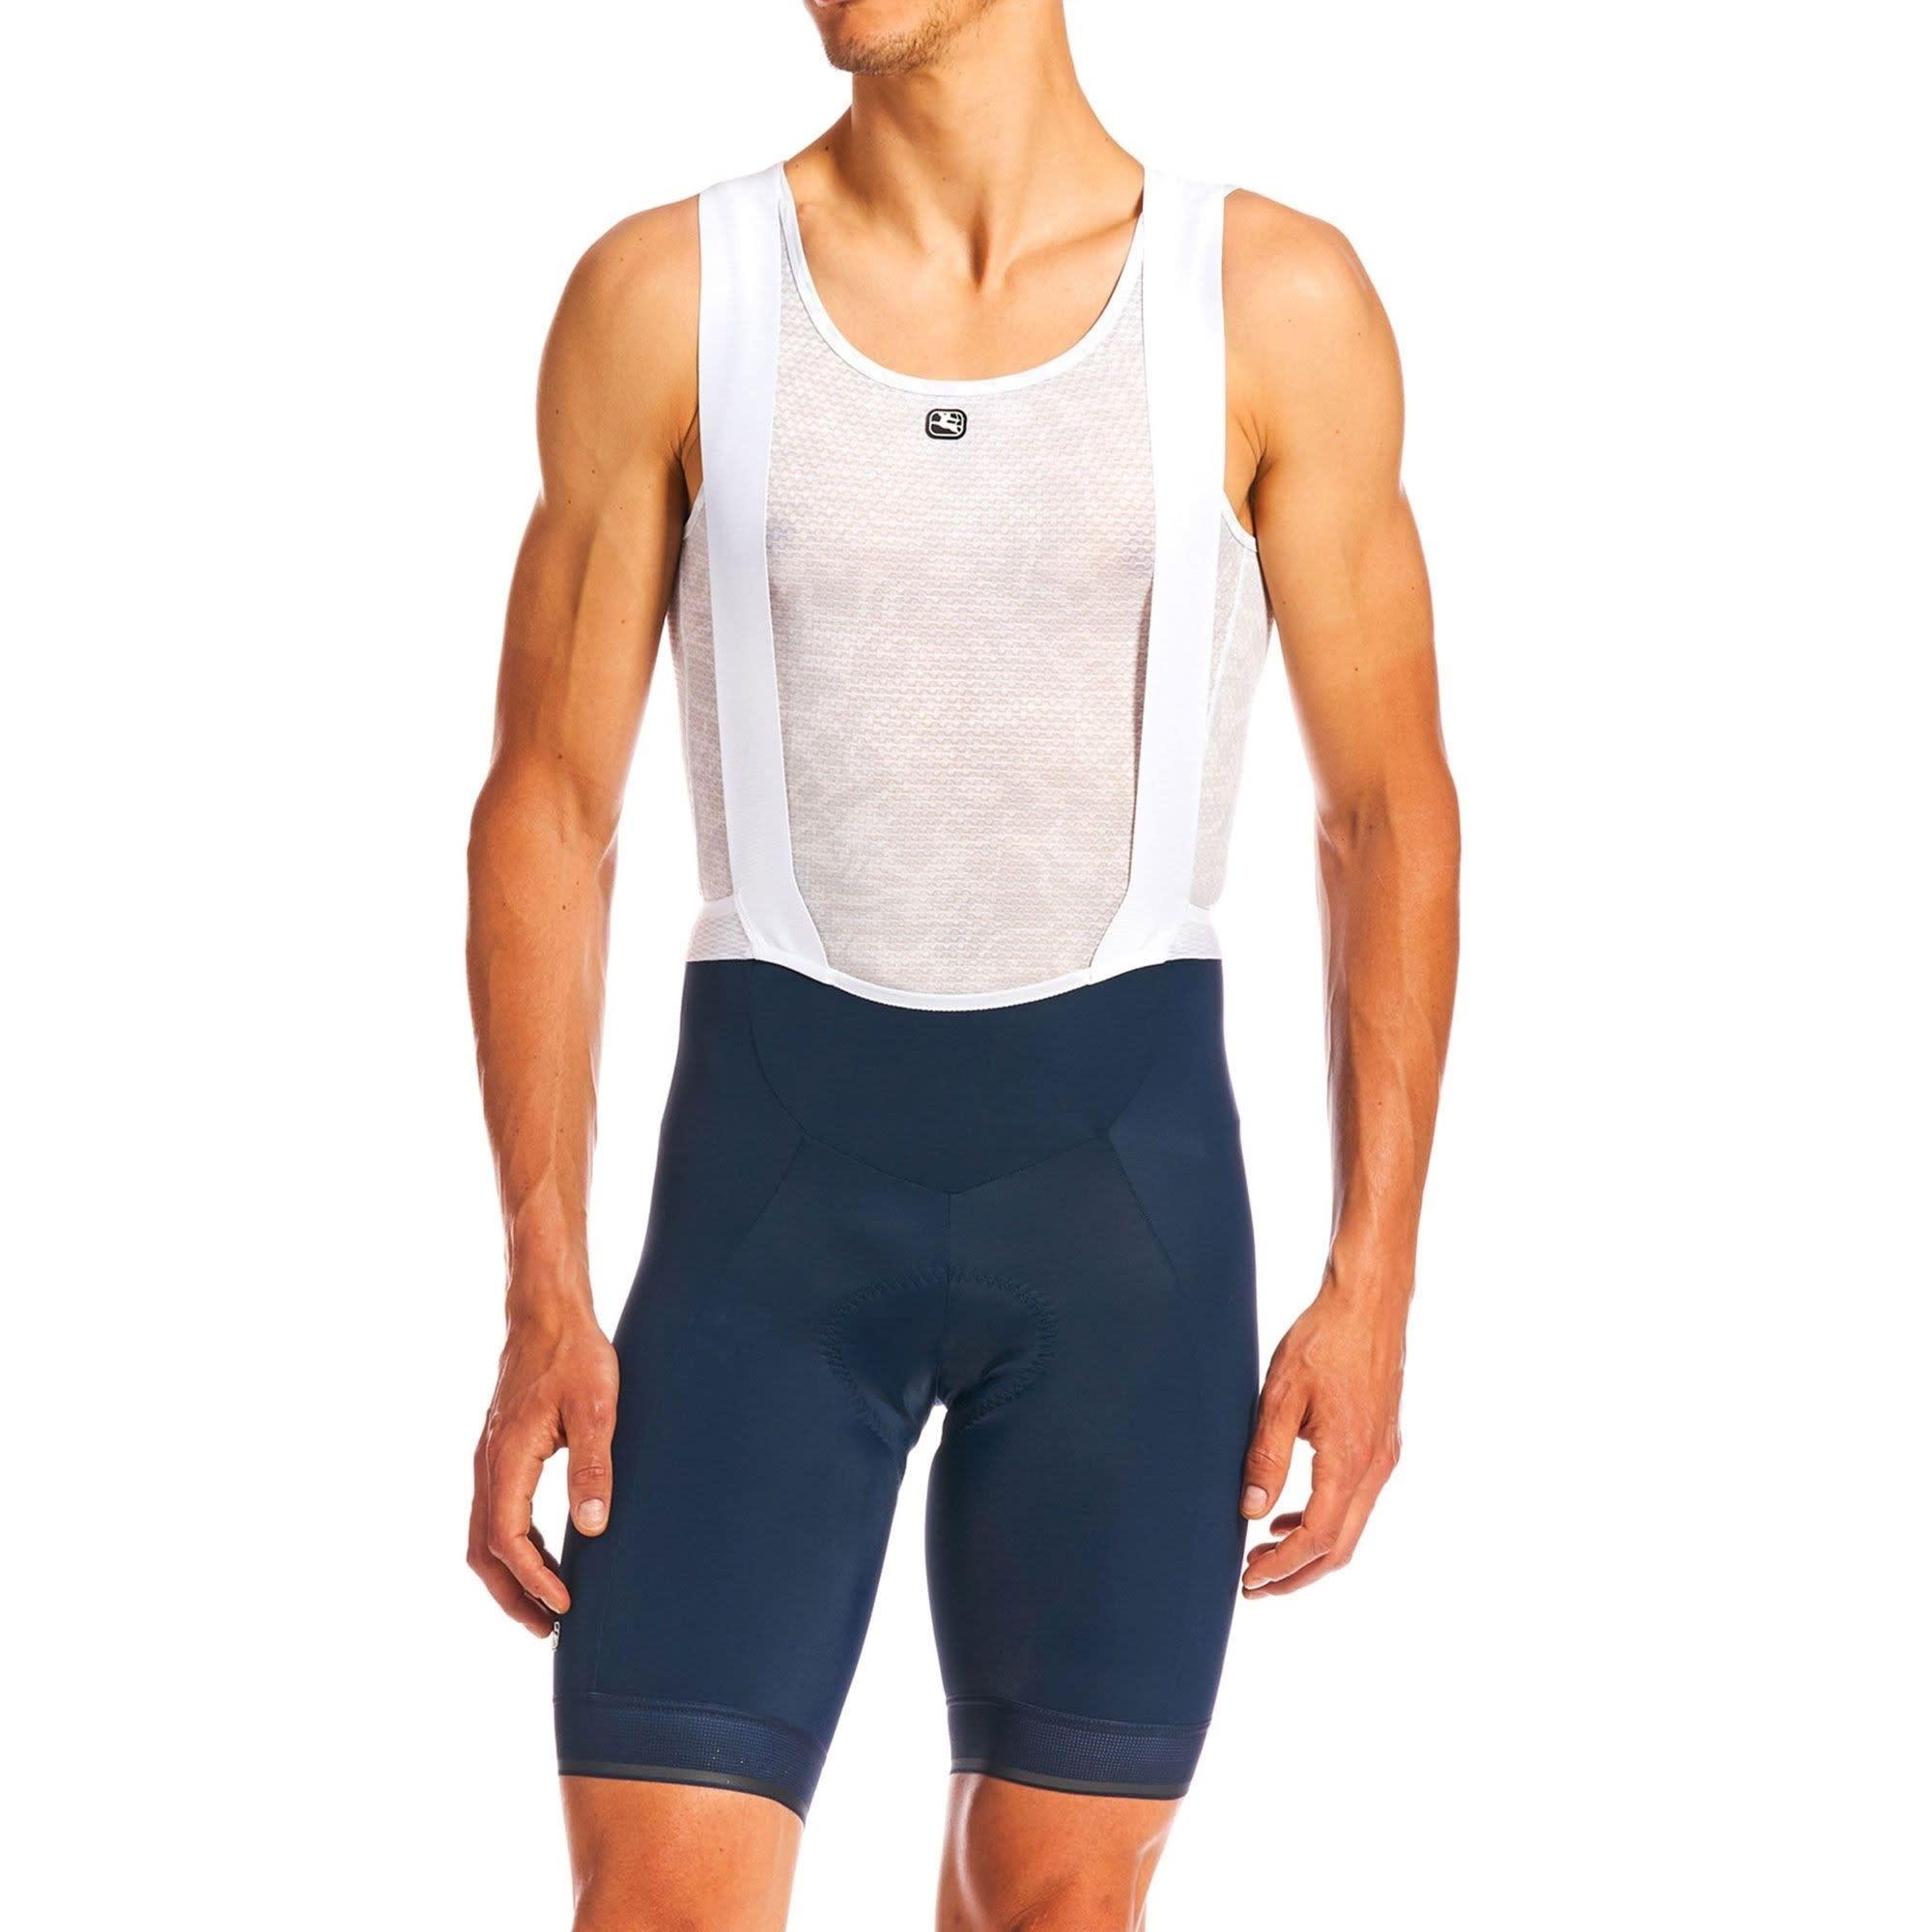 Giordana Giordana Fusion bib shorts - Midnight blue / Reflective XL